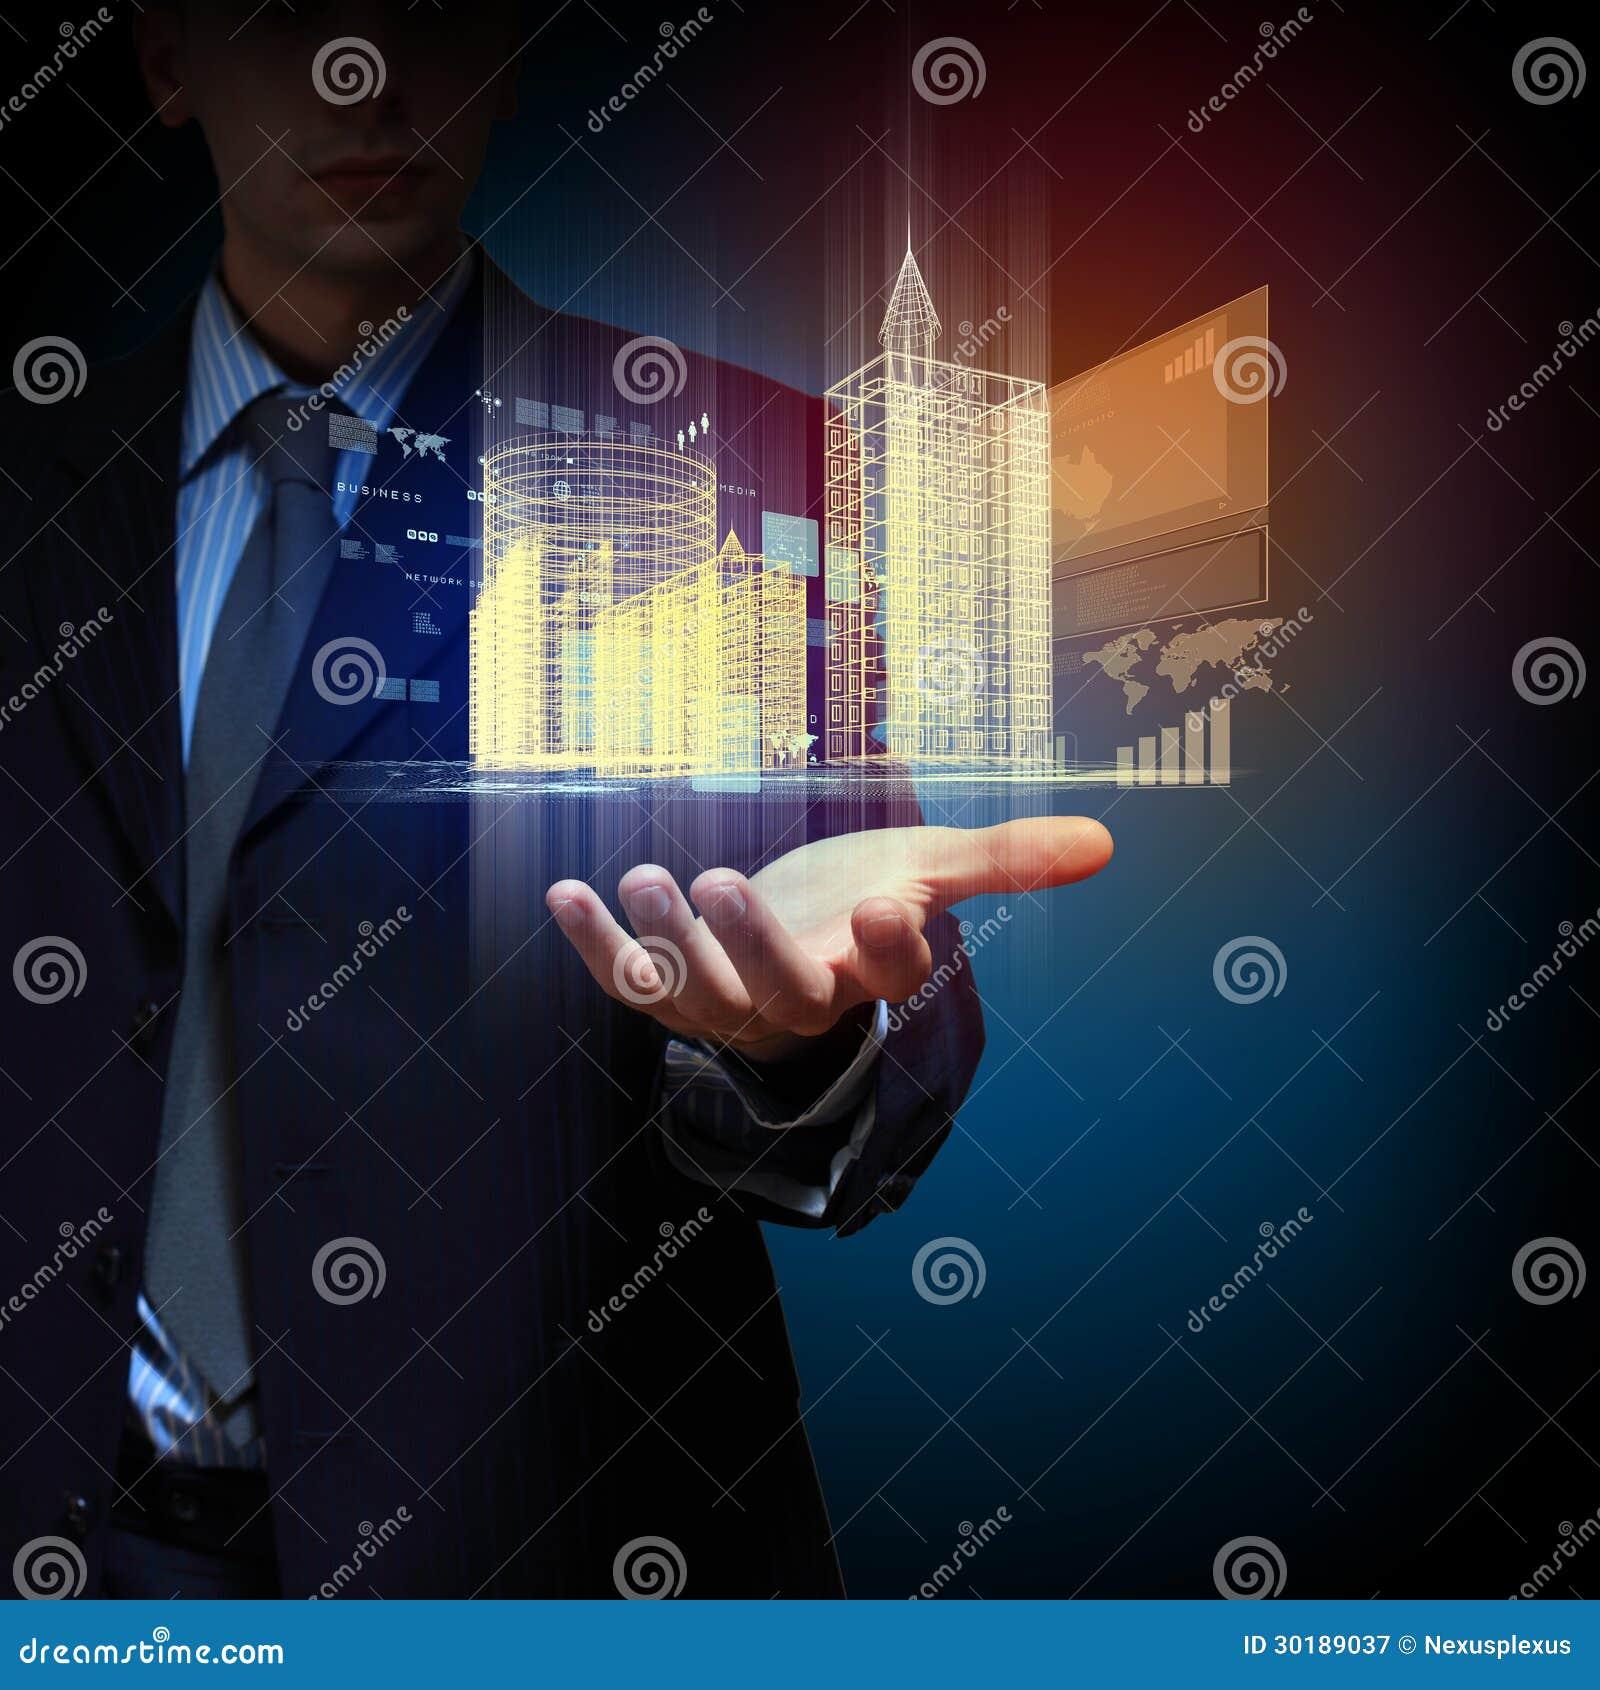 Engineering Automation Building Design Stock Illustration - Illustration of corporation ...